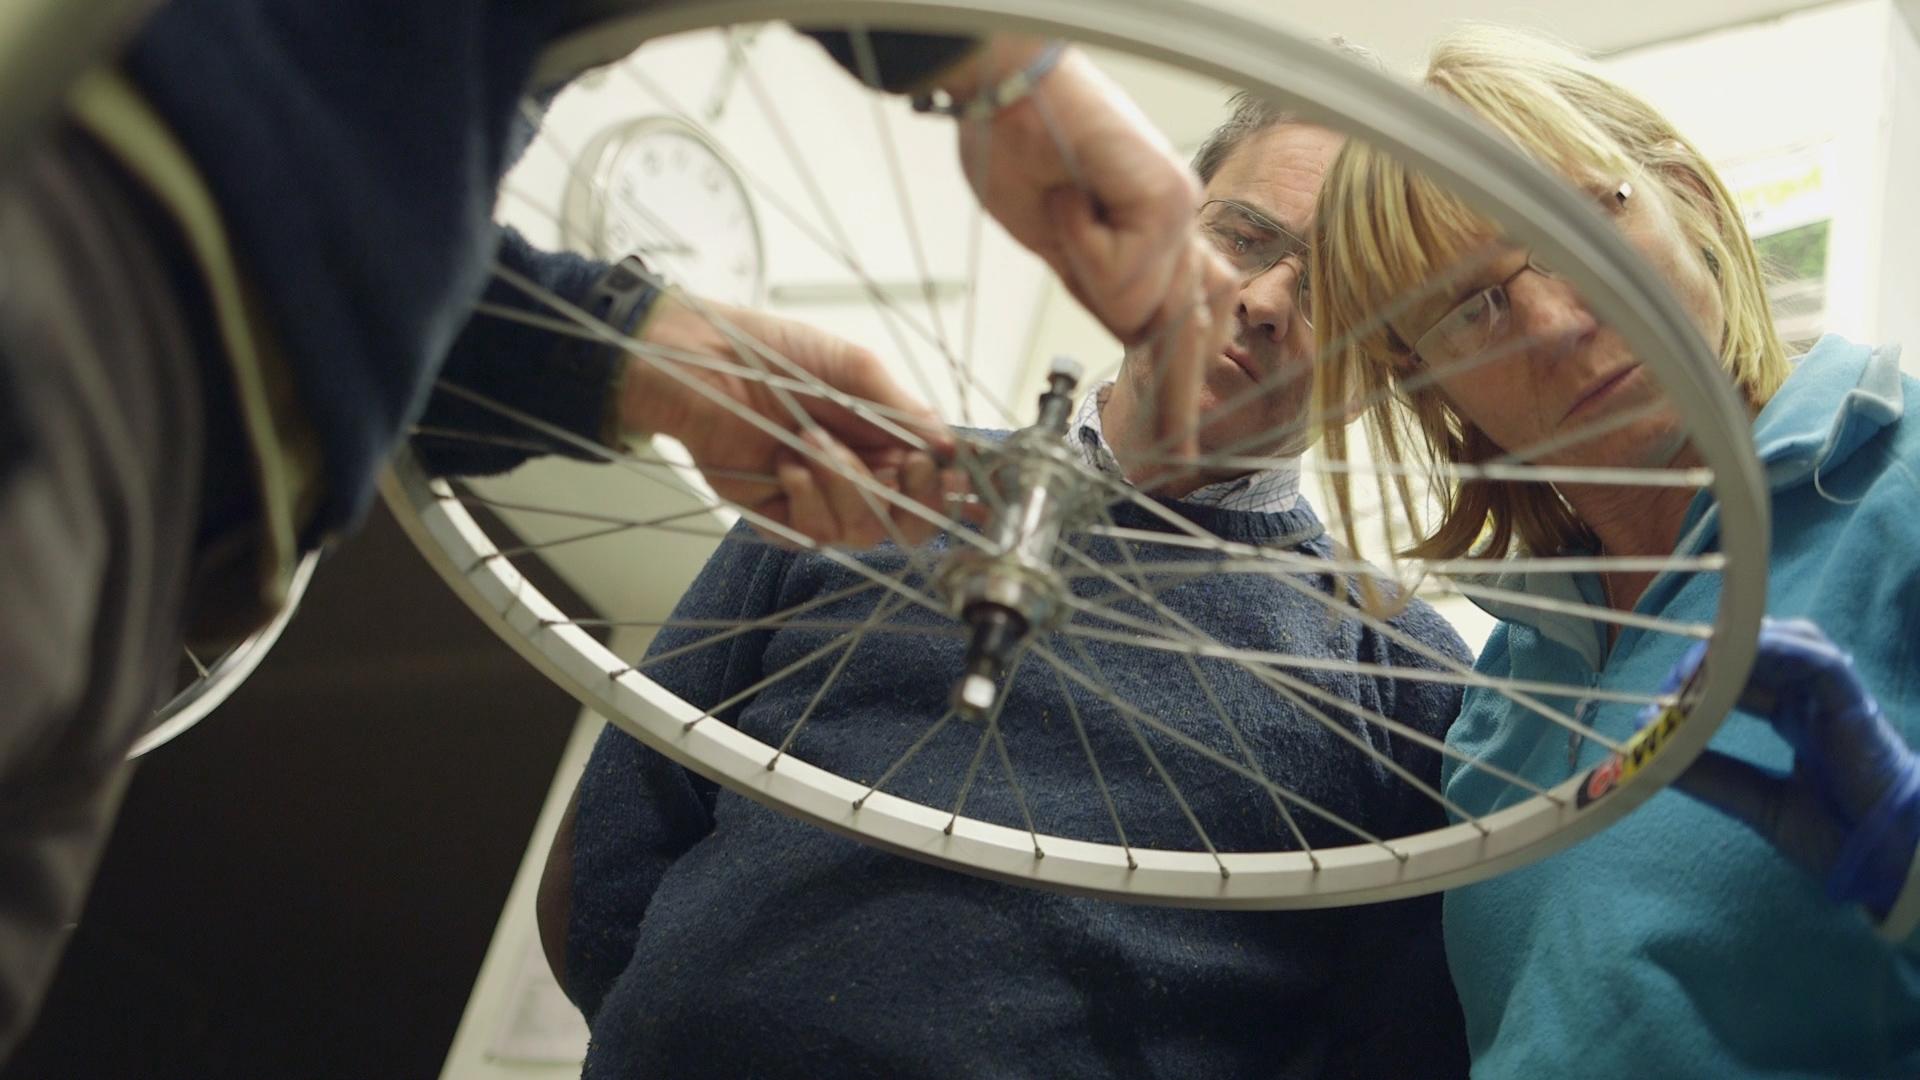 Win Bike fixing time, Cake or Beer!